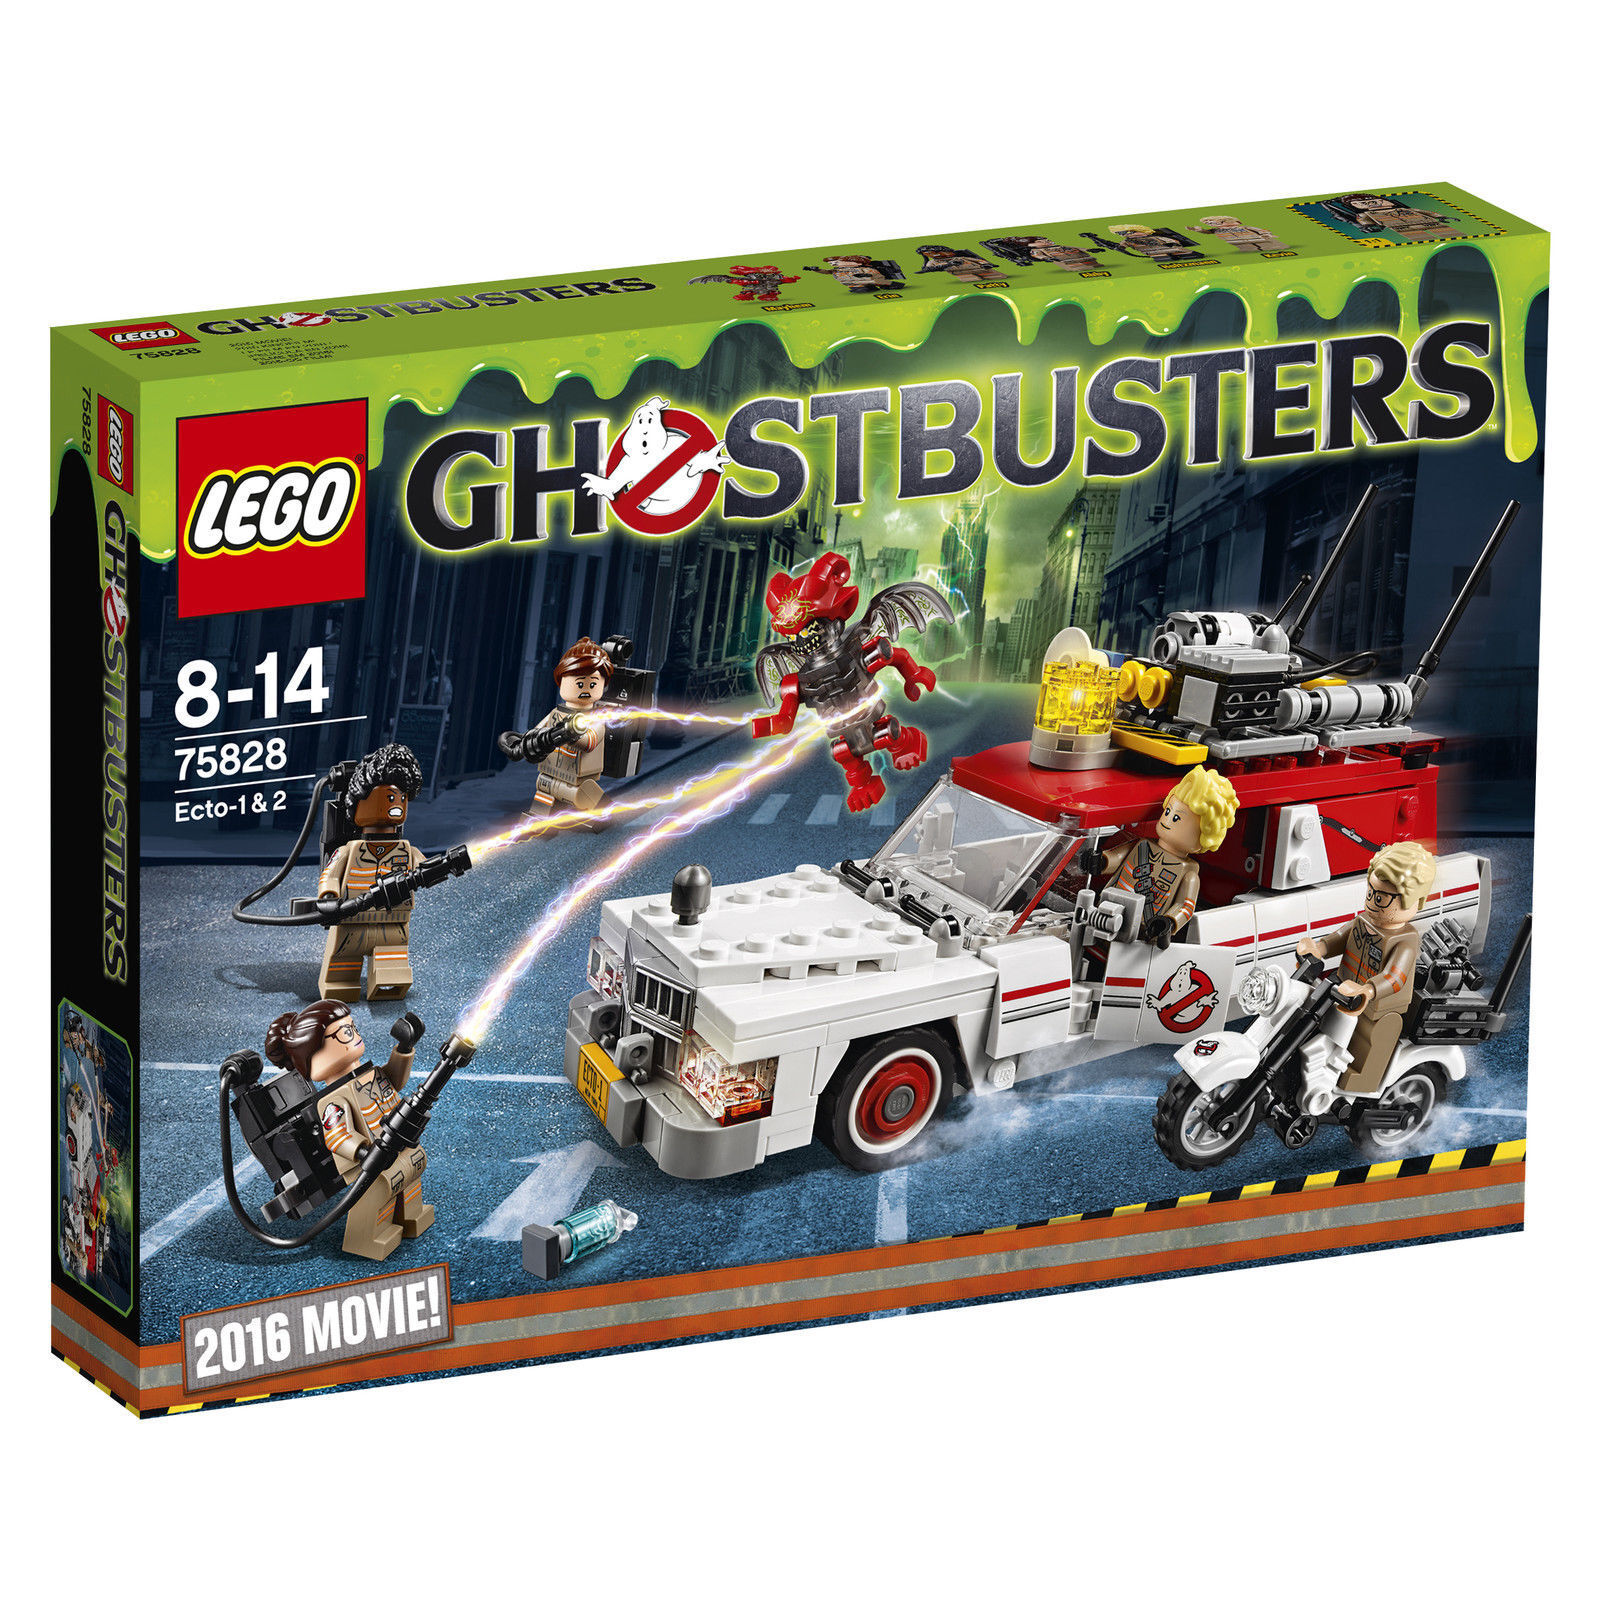 LEGO Ghostbusters Ecto-1 & 2 (75828), Neu, OVP